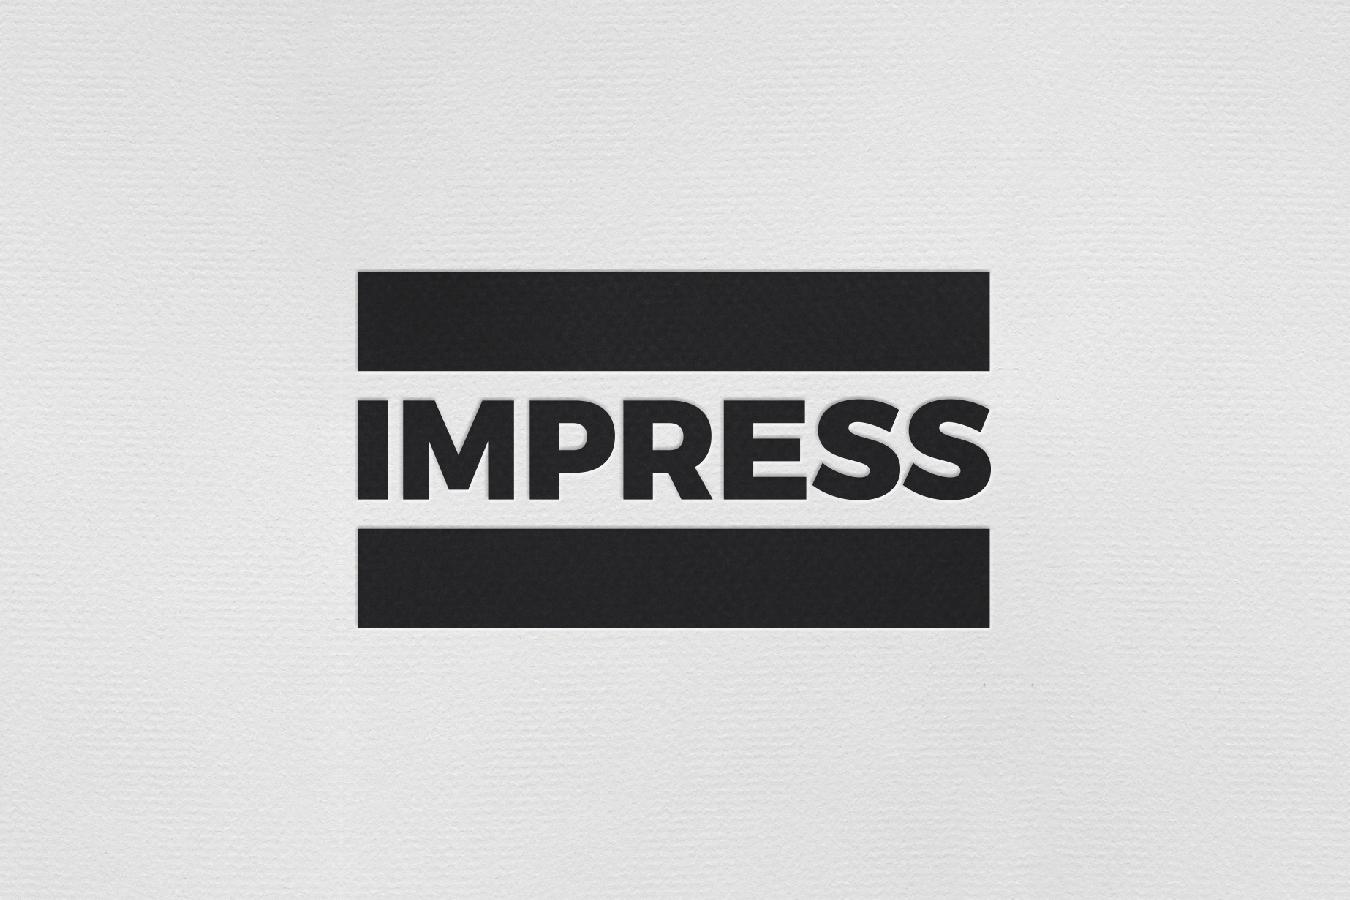 IMPRESS-01.jpg